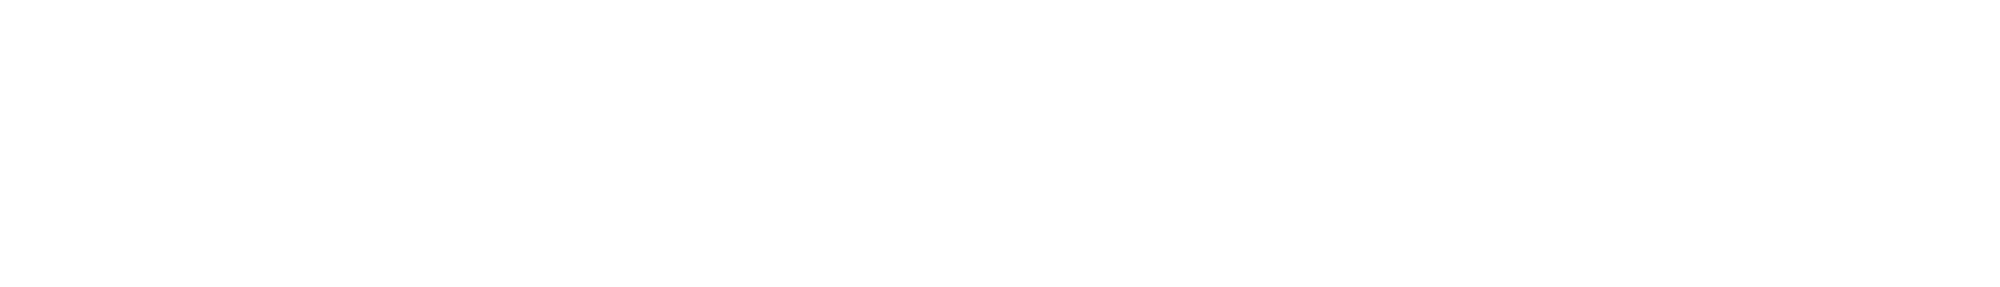 semicirculo